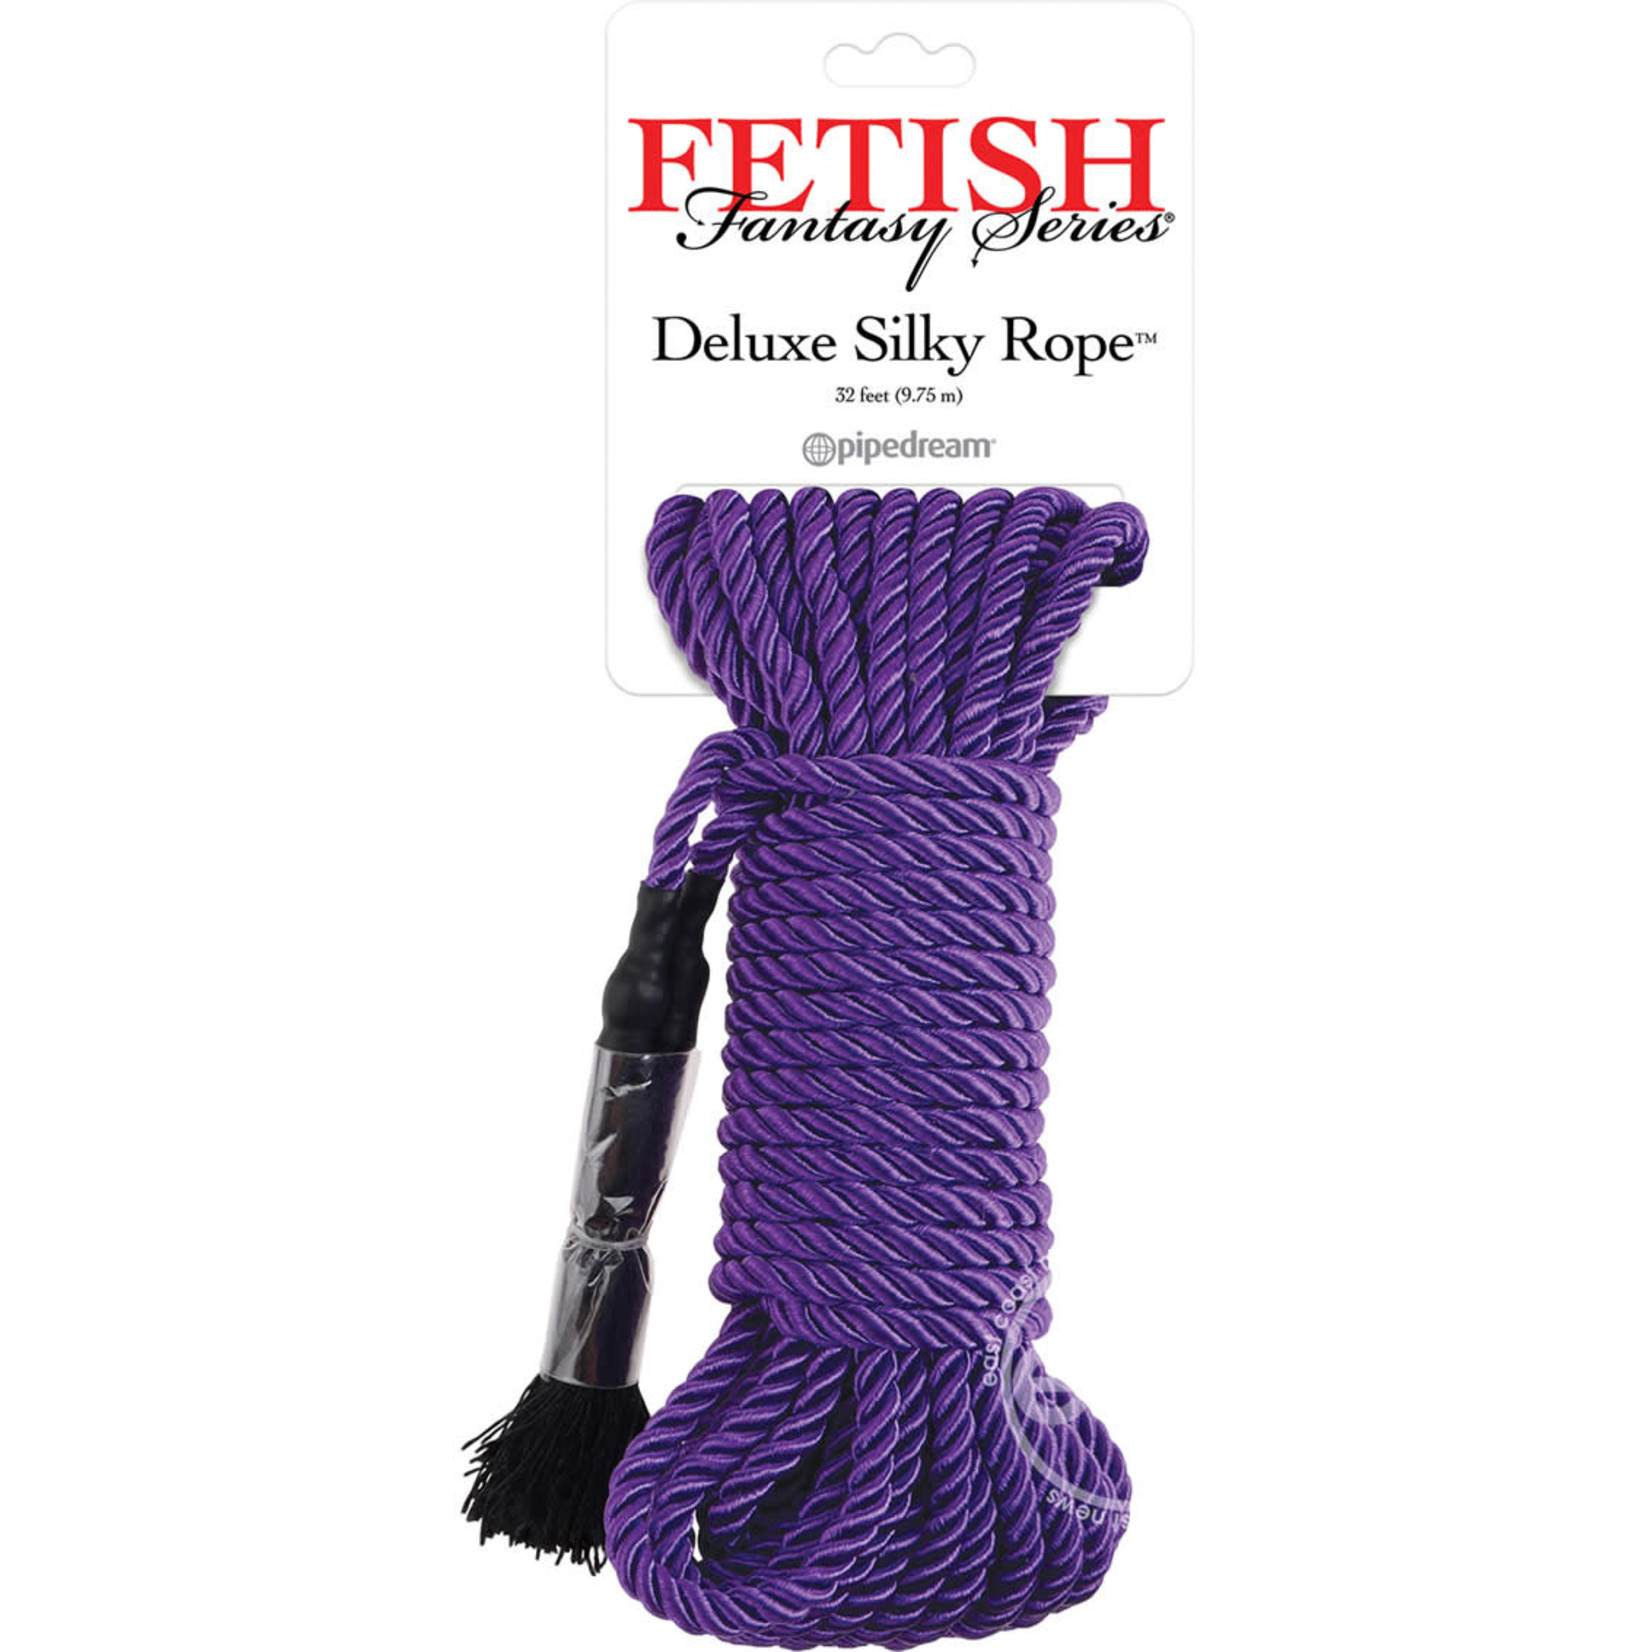 Festish Fantasy Series Deluxe Silk Rope Purple 32 Feet